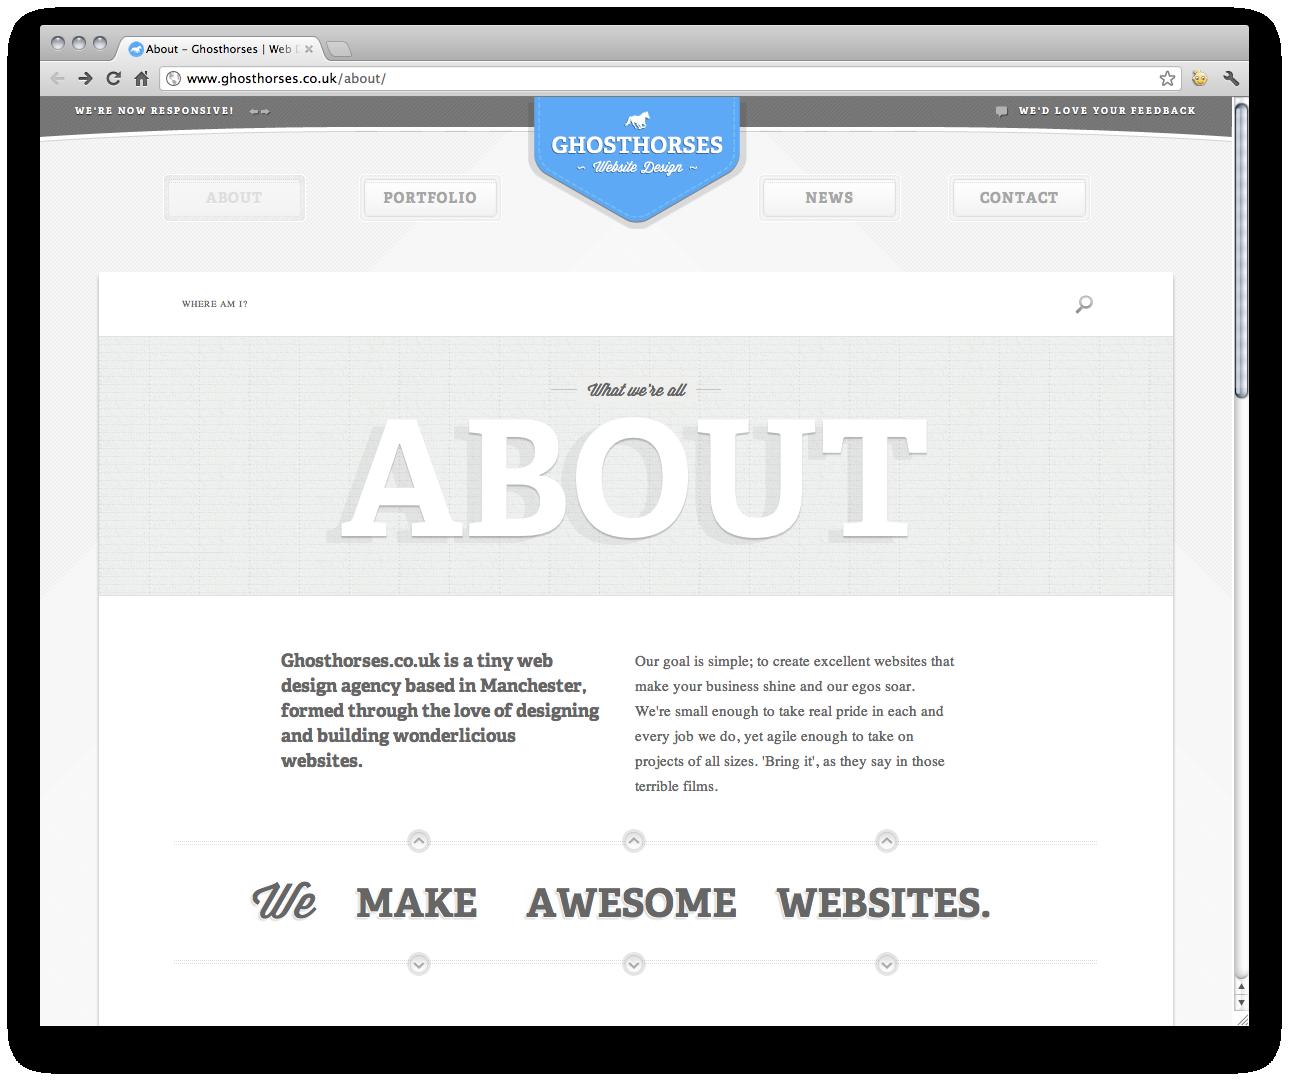 Responsive Design Http Www Ghosthorses Co Uk About Web Design Resources Website Design Inspiration Web Design